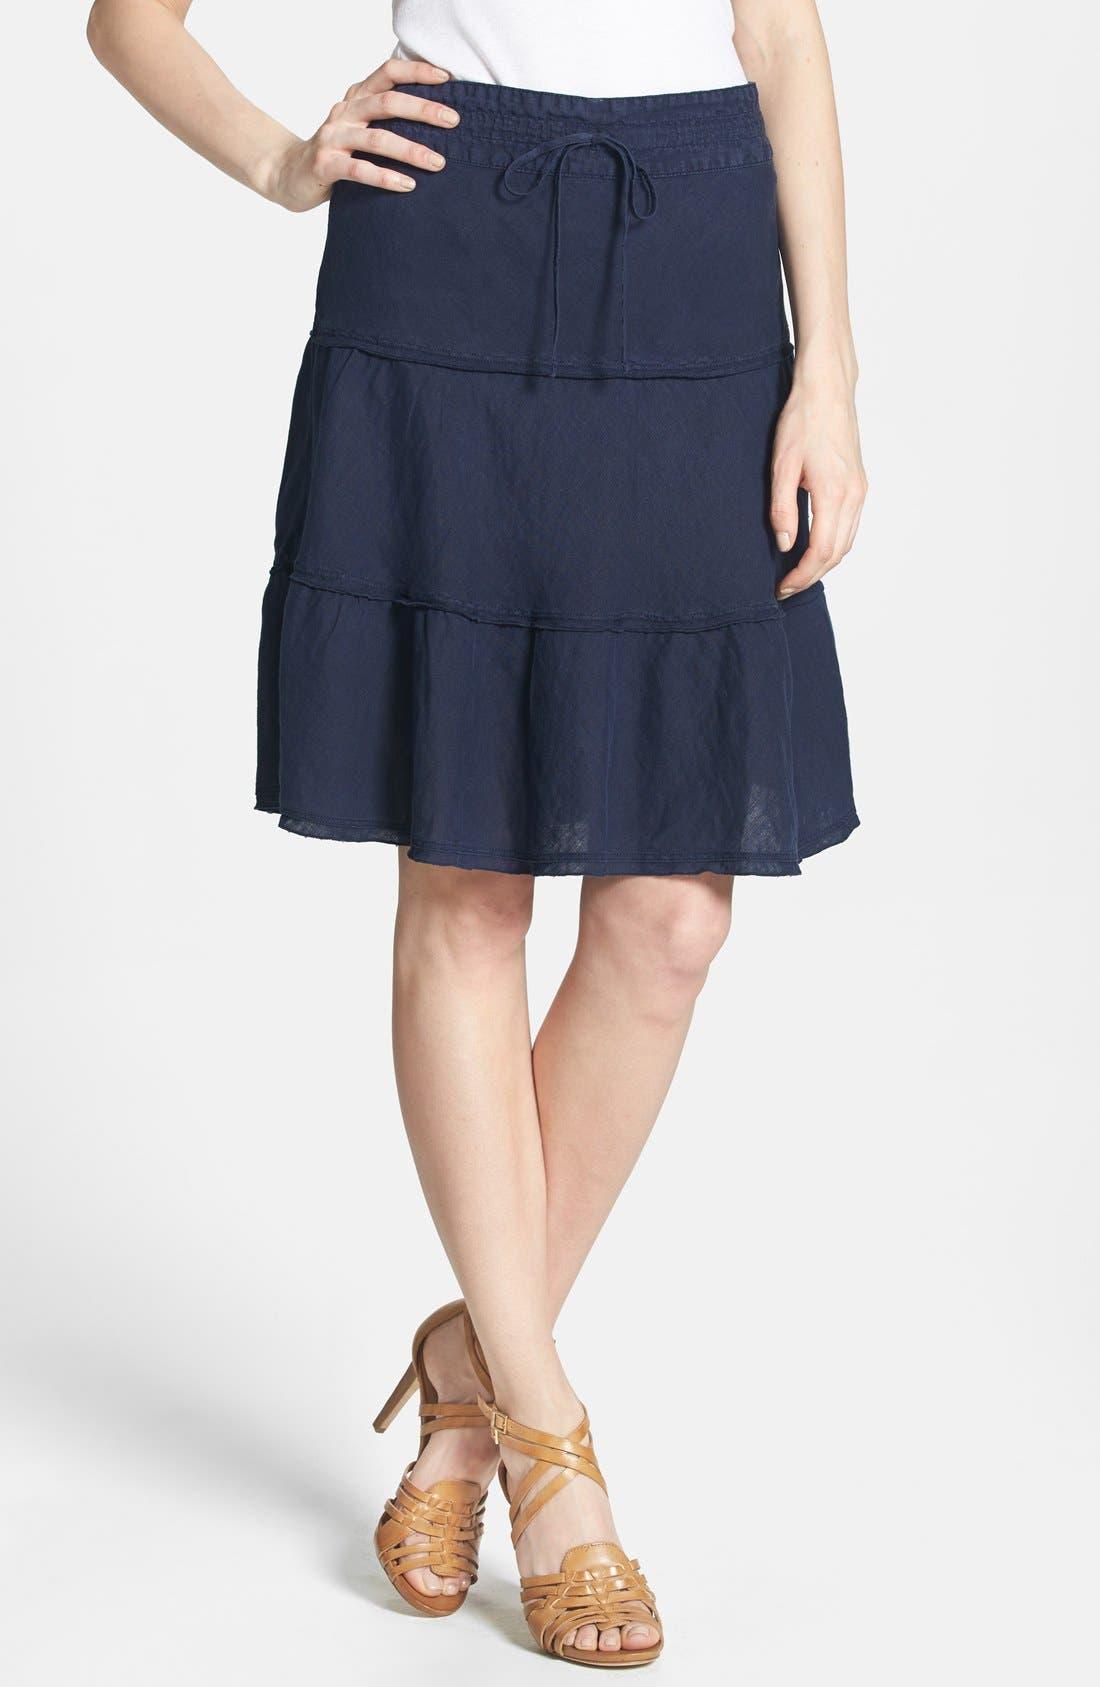 Alternate Image 1 Selected - Caslon® Drawstring Waist Tiered Linen Skirt (Regular & Petite)